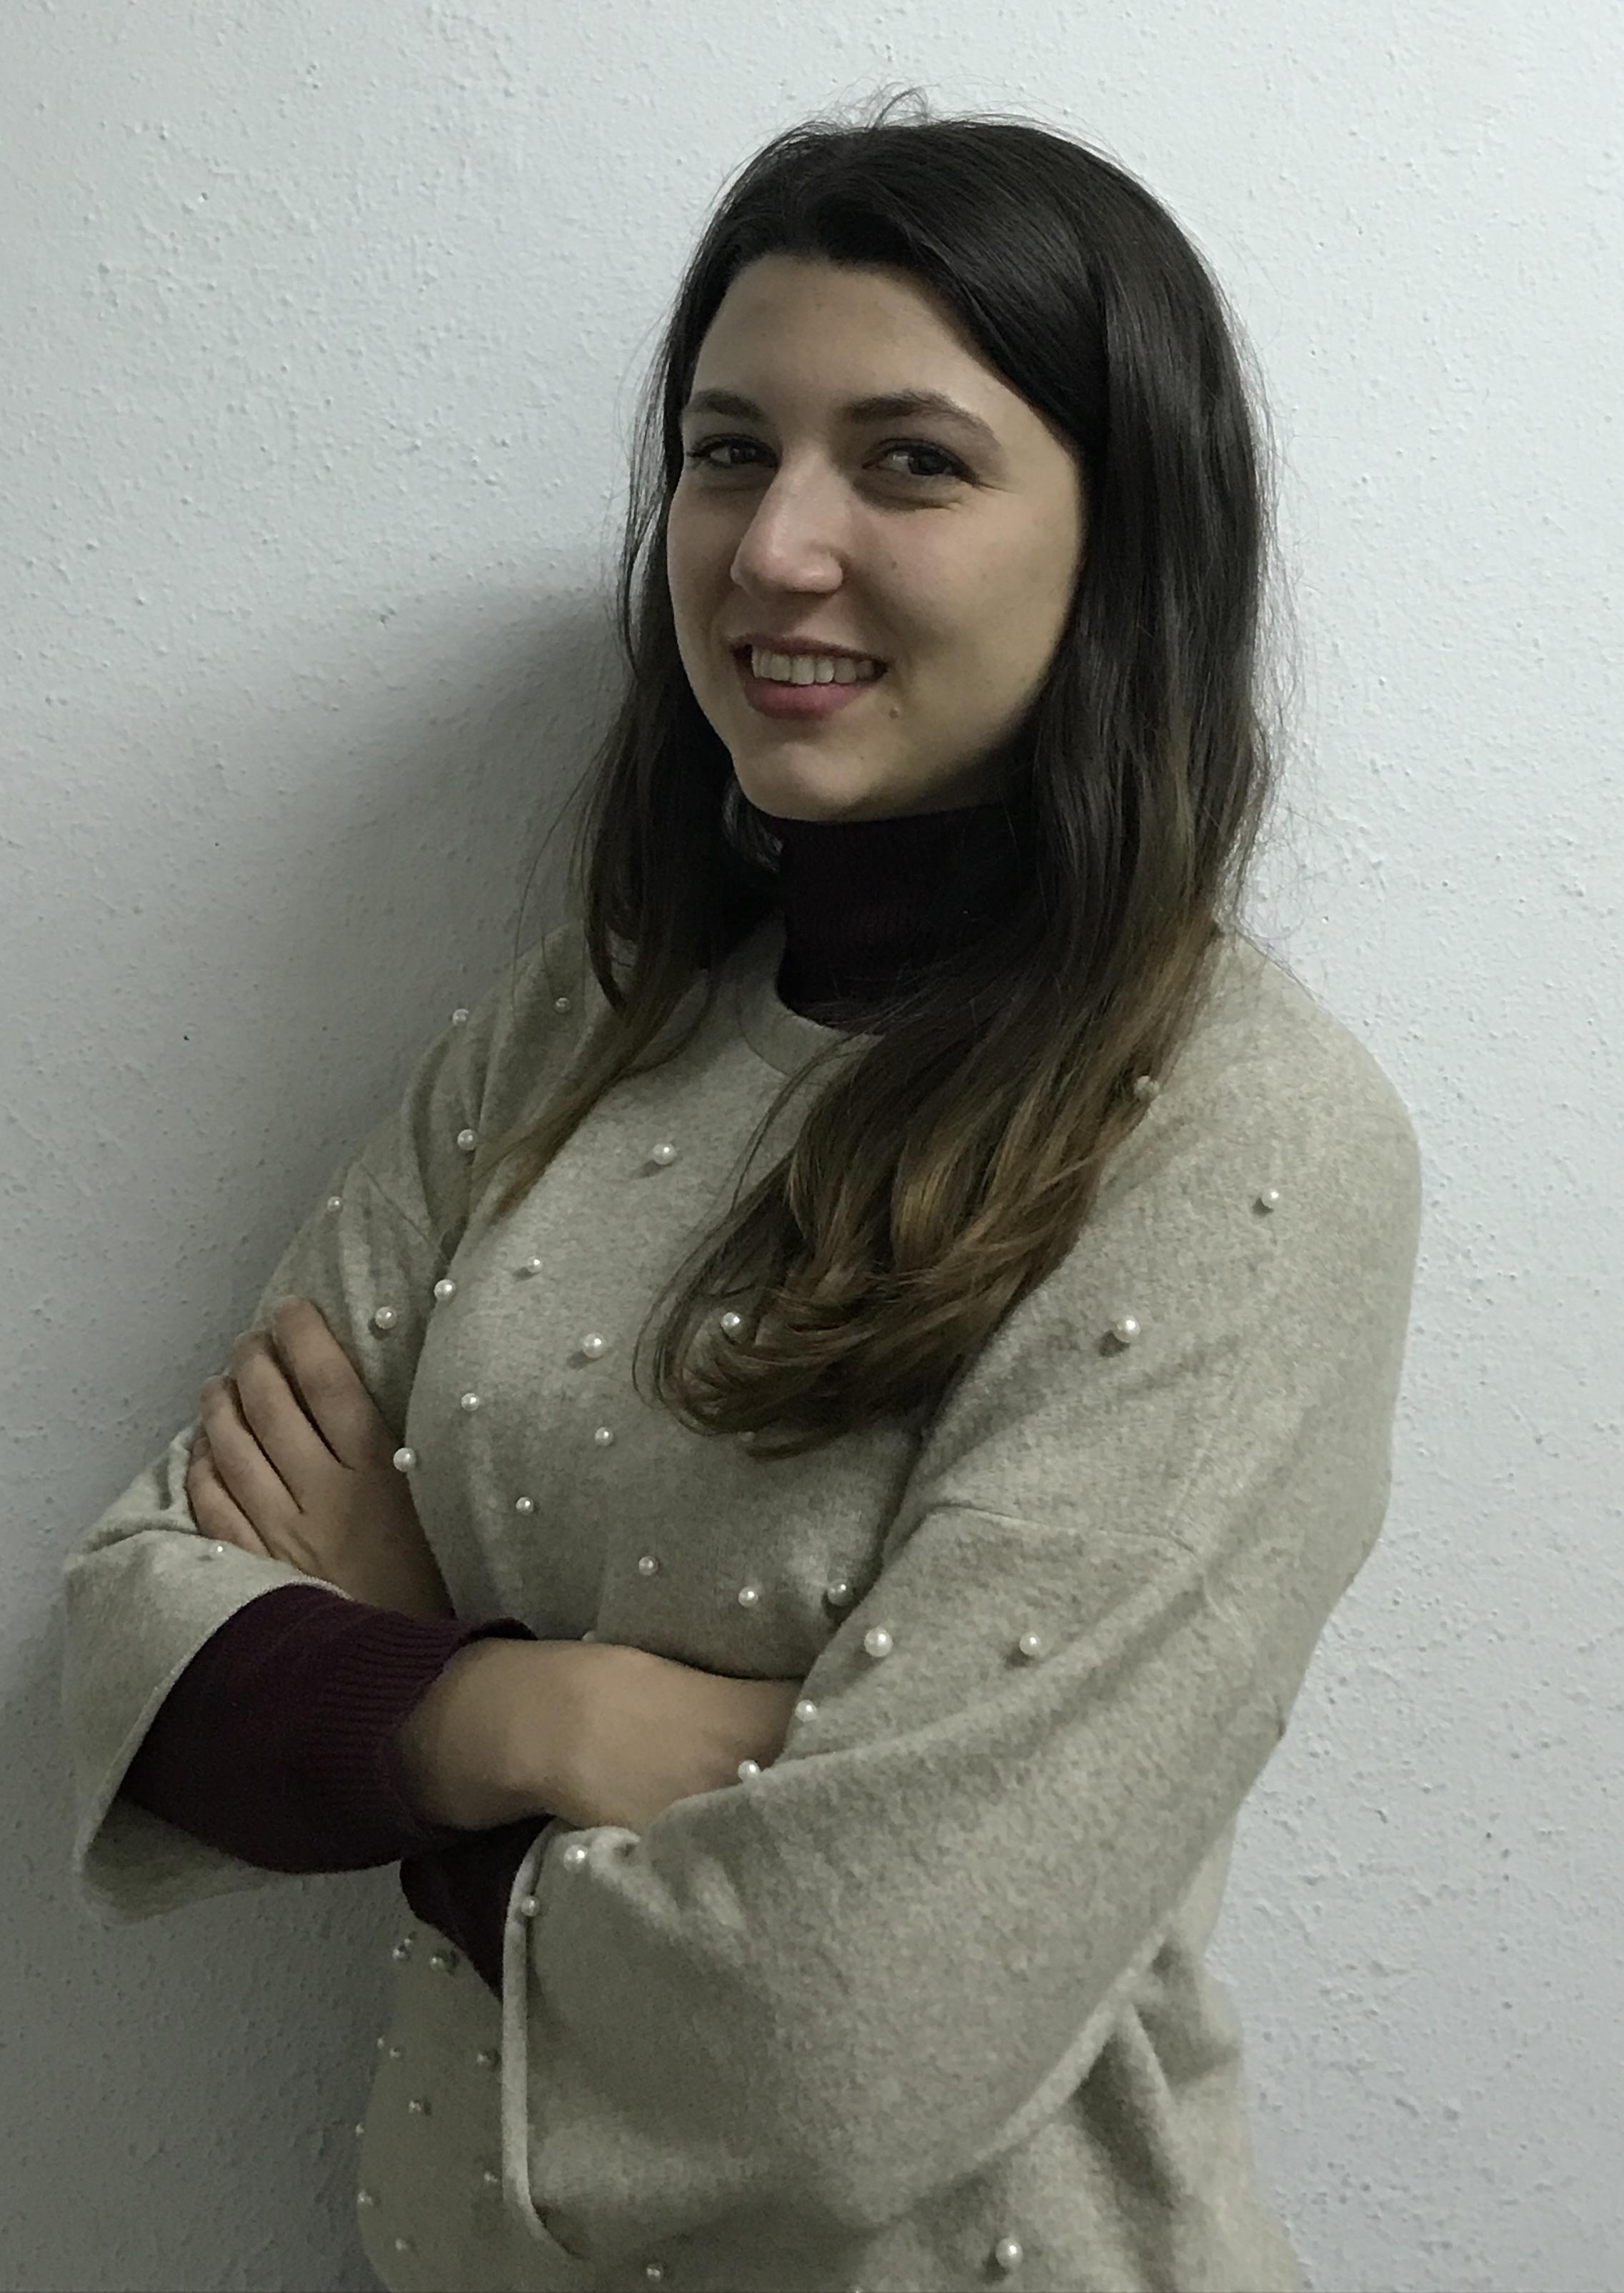 aleksandra filipovic